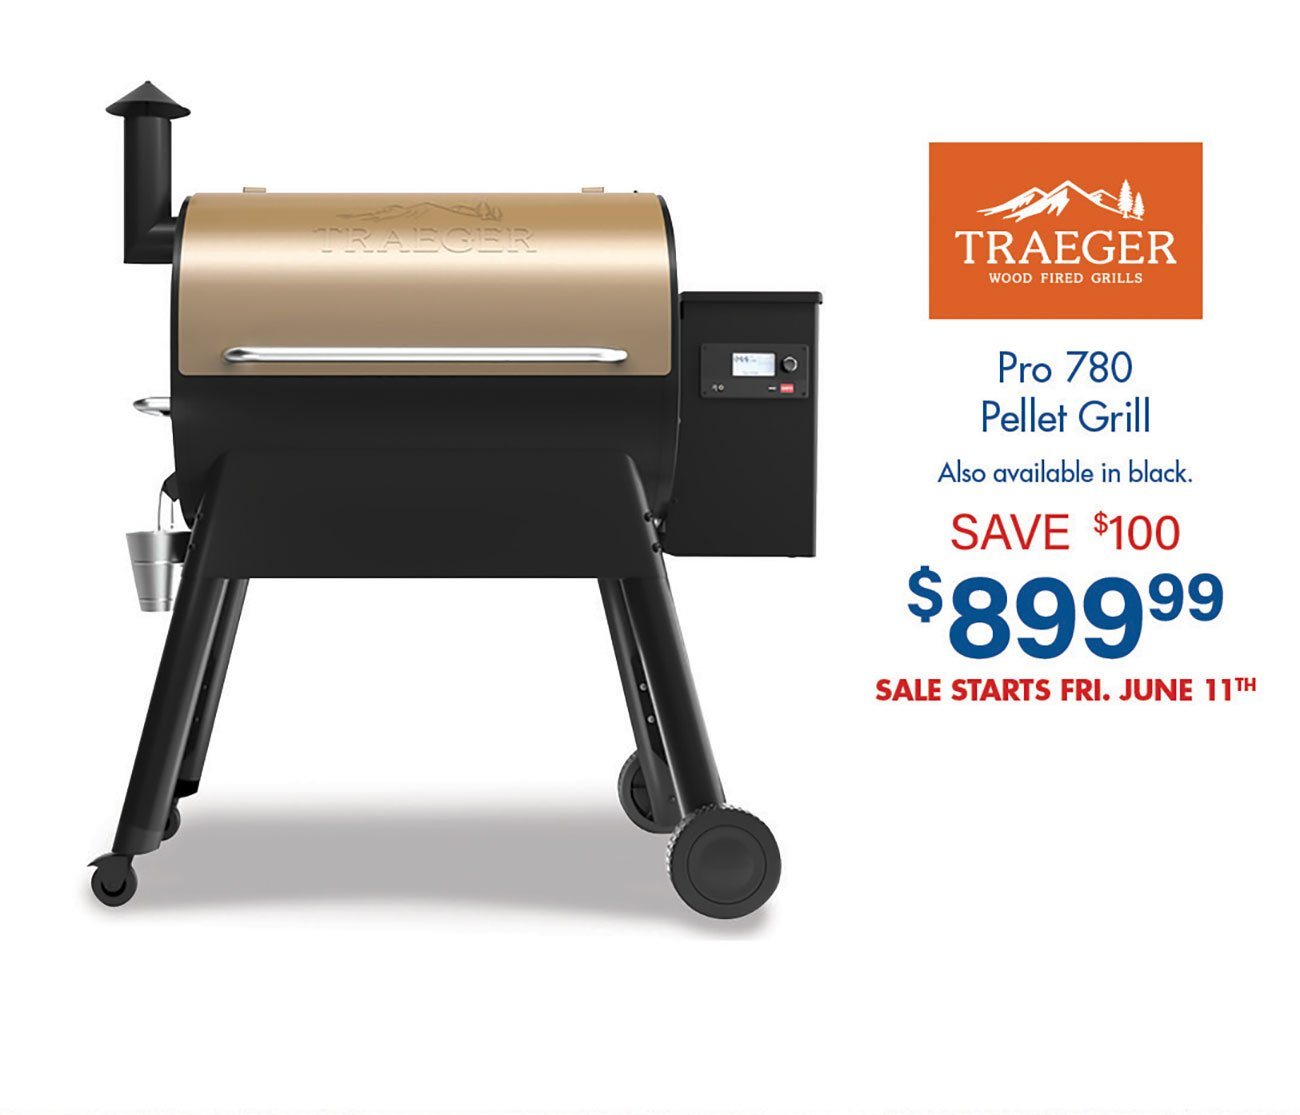 Traeger-Pro-780-Pellet-Grill-Bronze